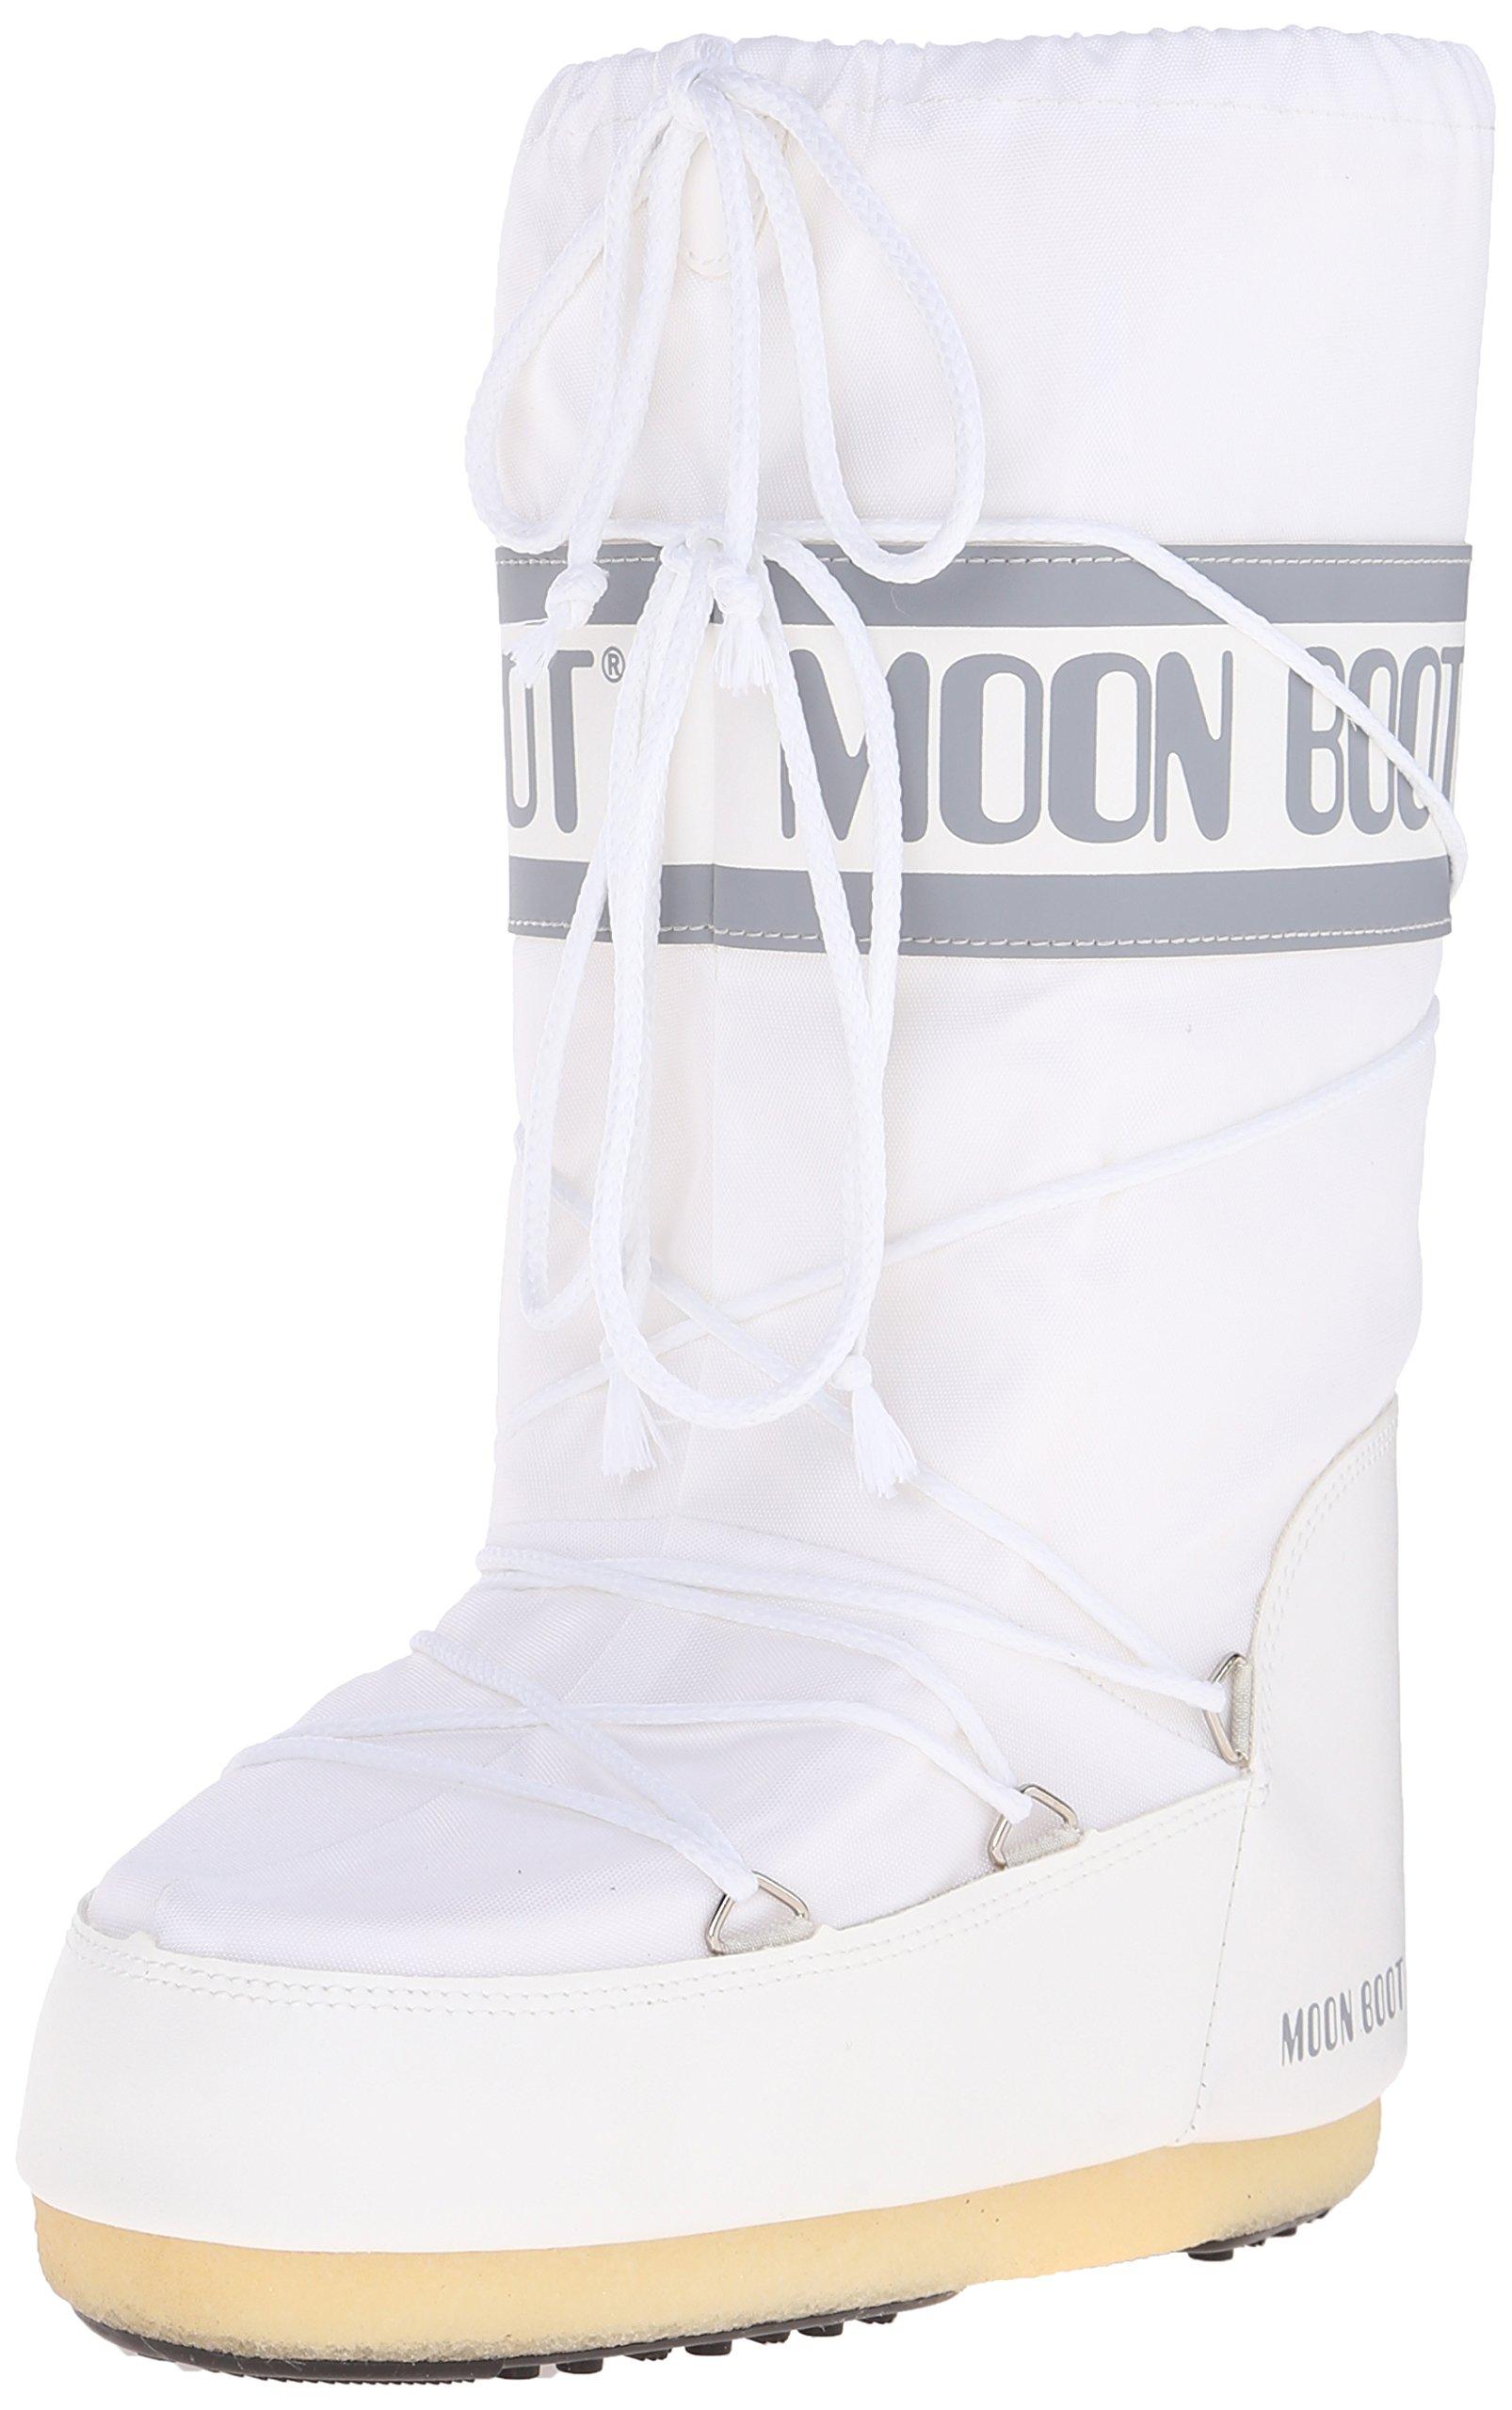 Tecnica Moon Boot Nylon - Women's White, 42.0/44.0